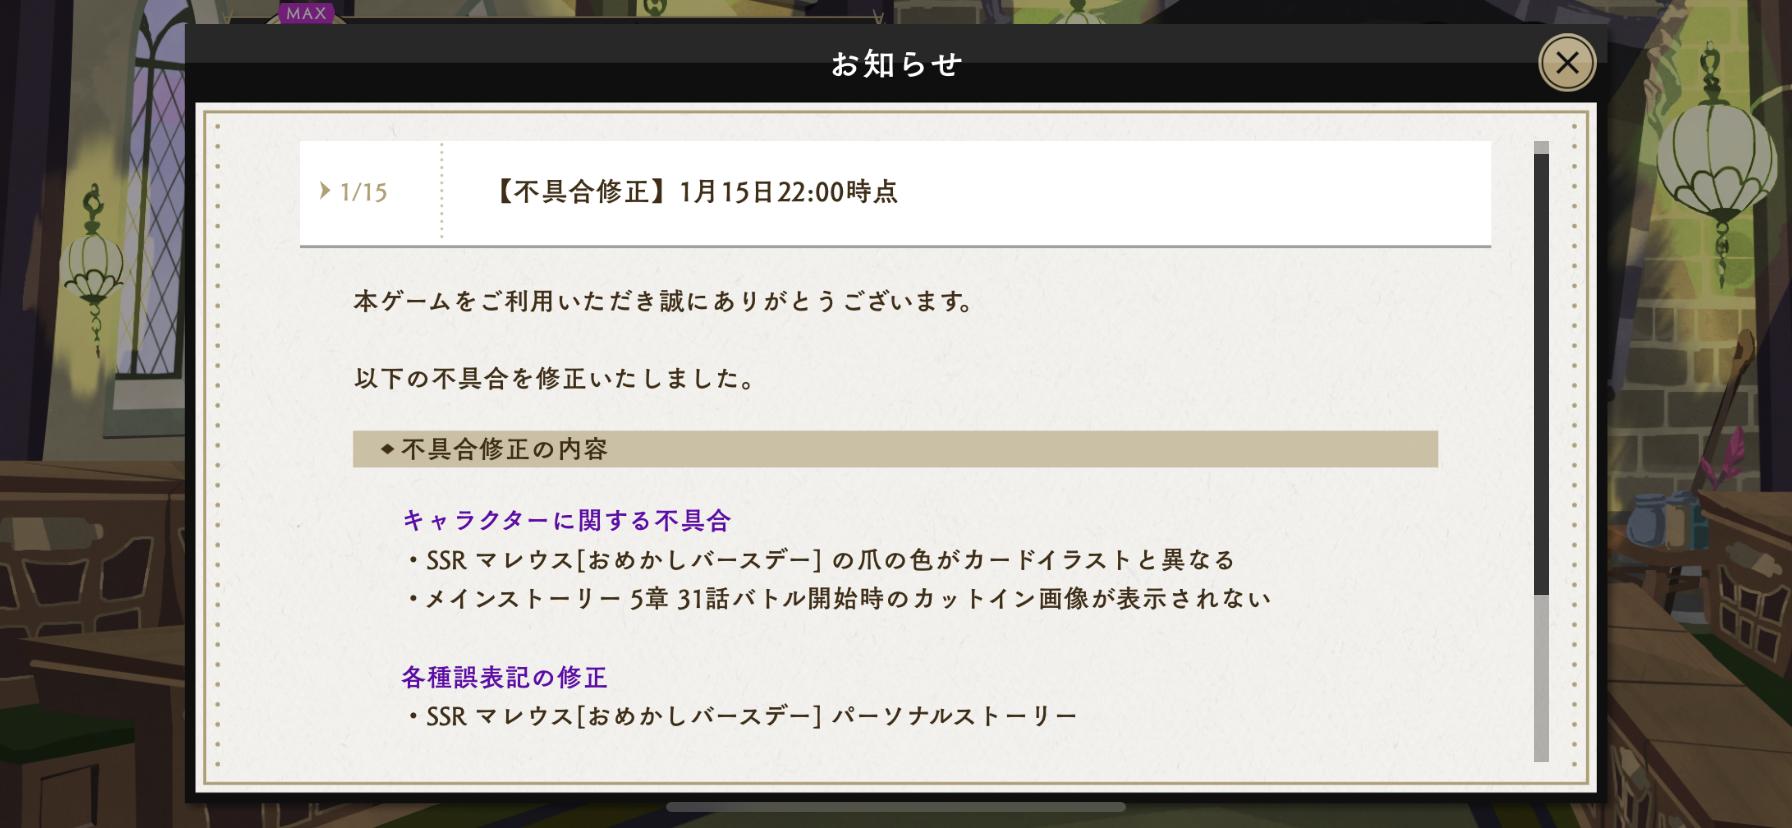 f:id:motimoti444:20210116002128p:plain